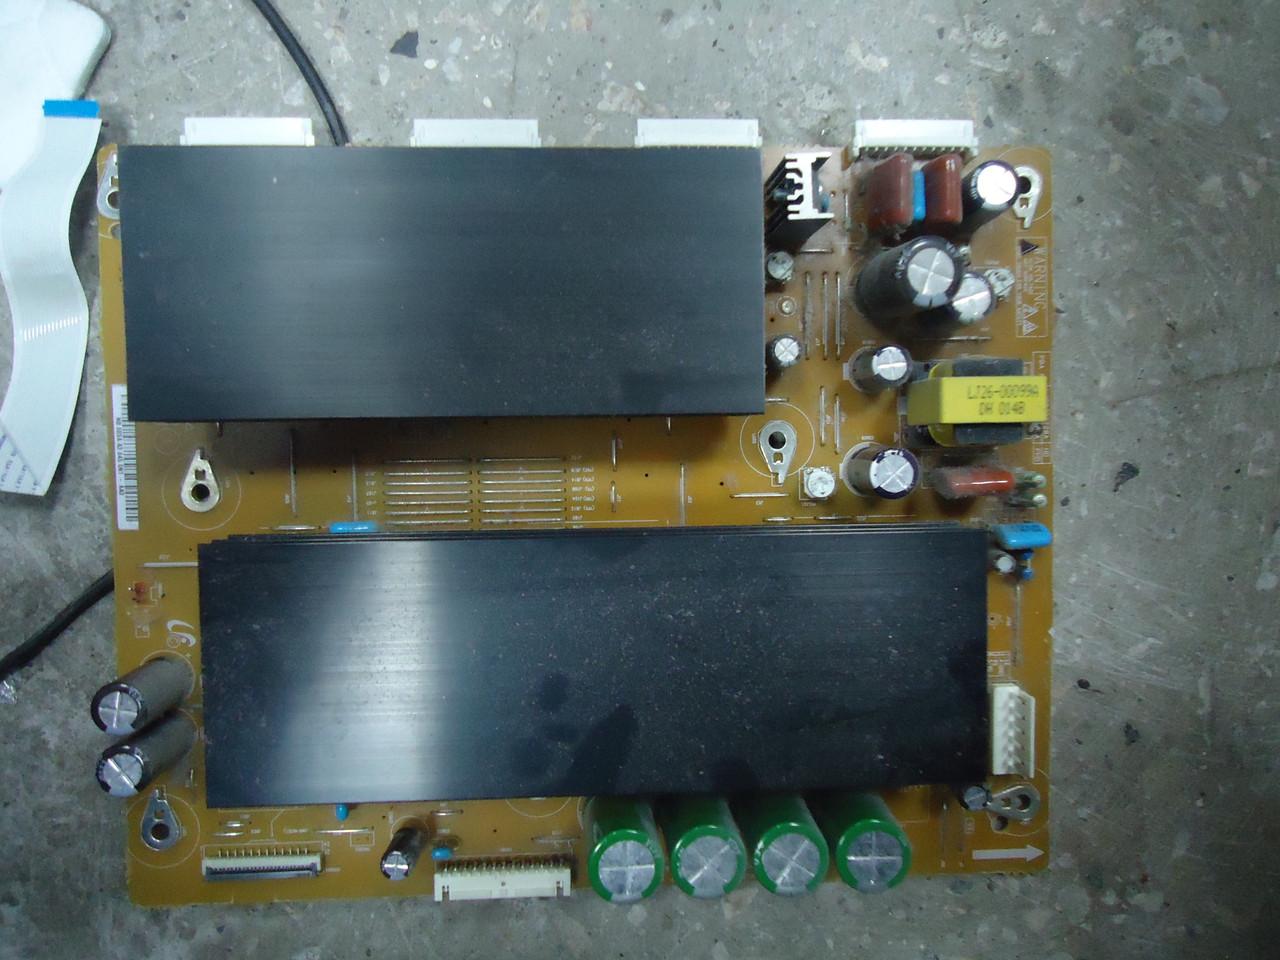 Плазма Samsung PS-50C550 запчасти (BN44-00330B, BN44-00329, LJ41-08458A, LJ92-01728A, LJ41-08457A, LJ92-01727)